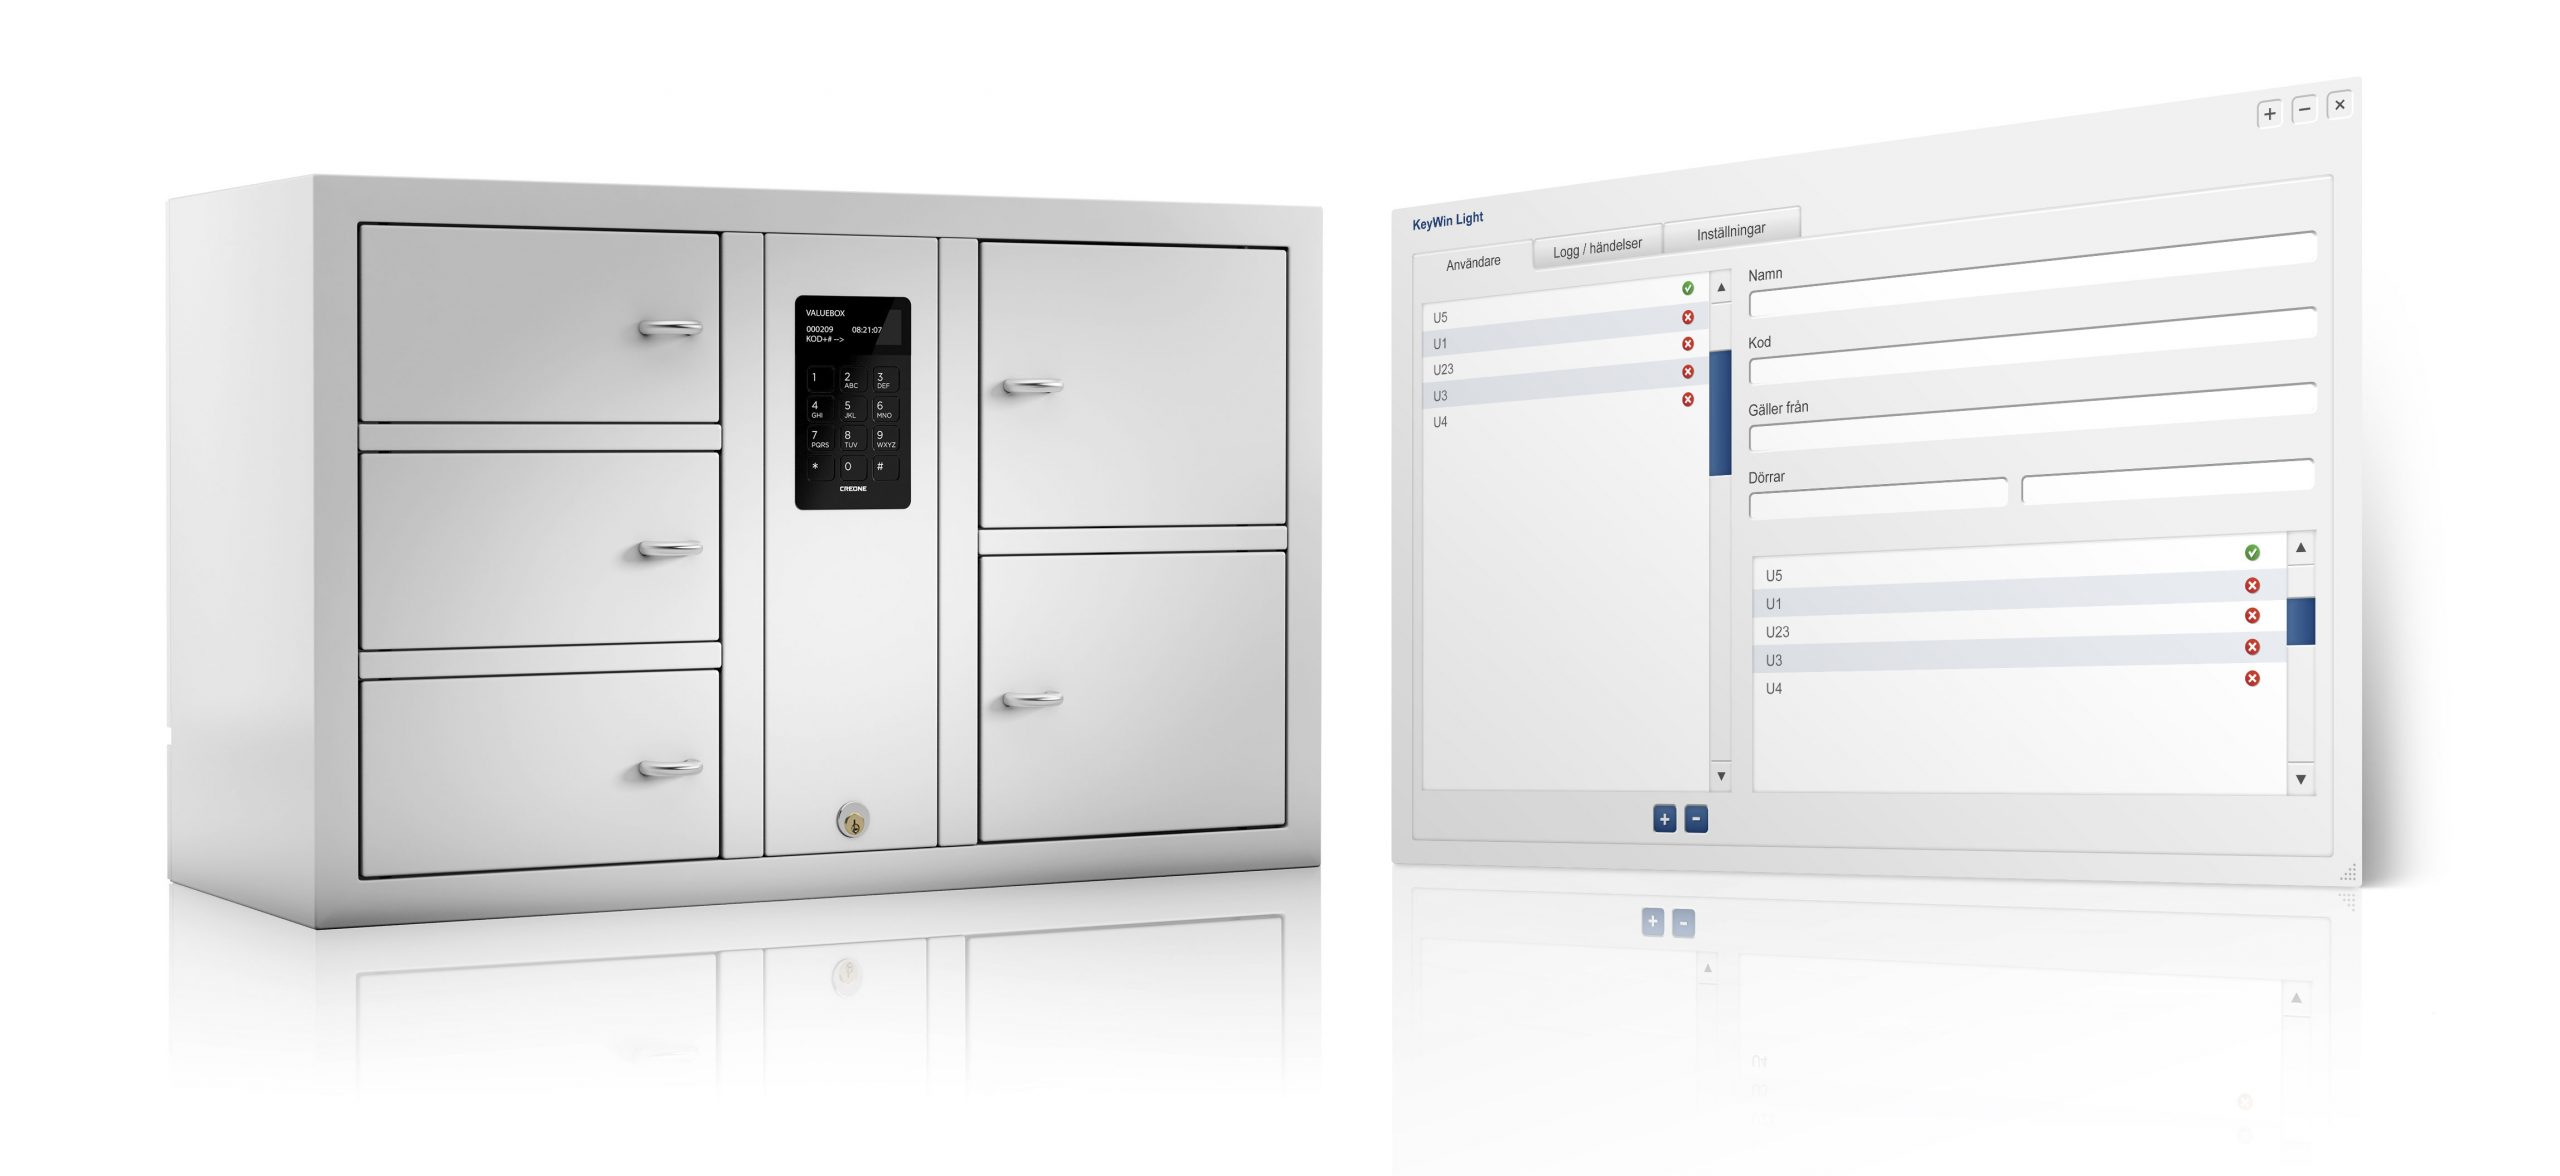 KeyWinLightソフトウェアを使用したValueBox7006 Sによる貴重品の管理